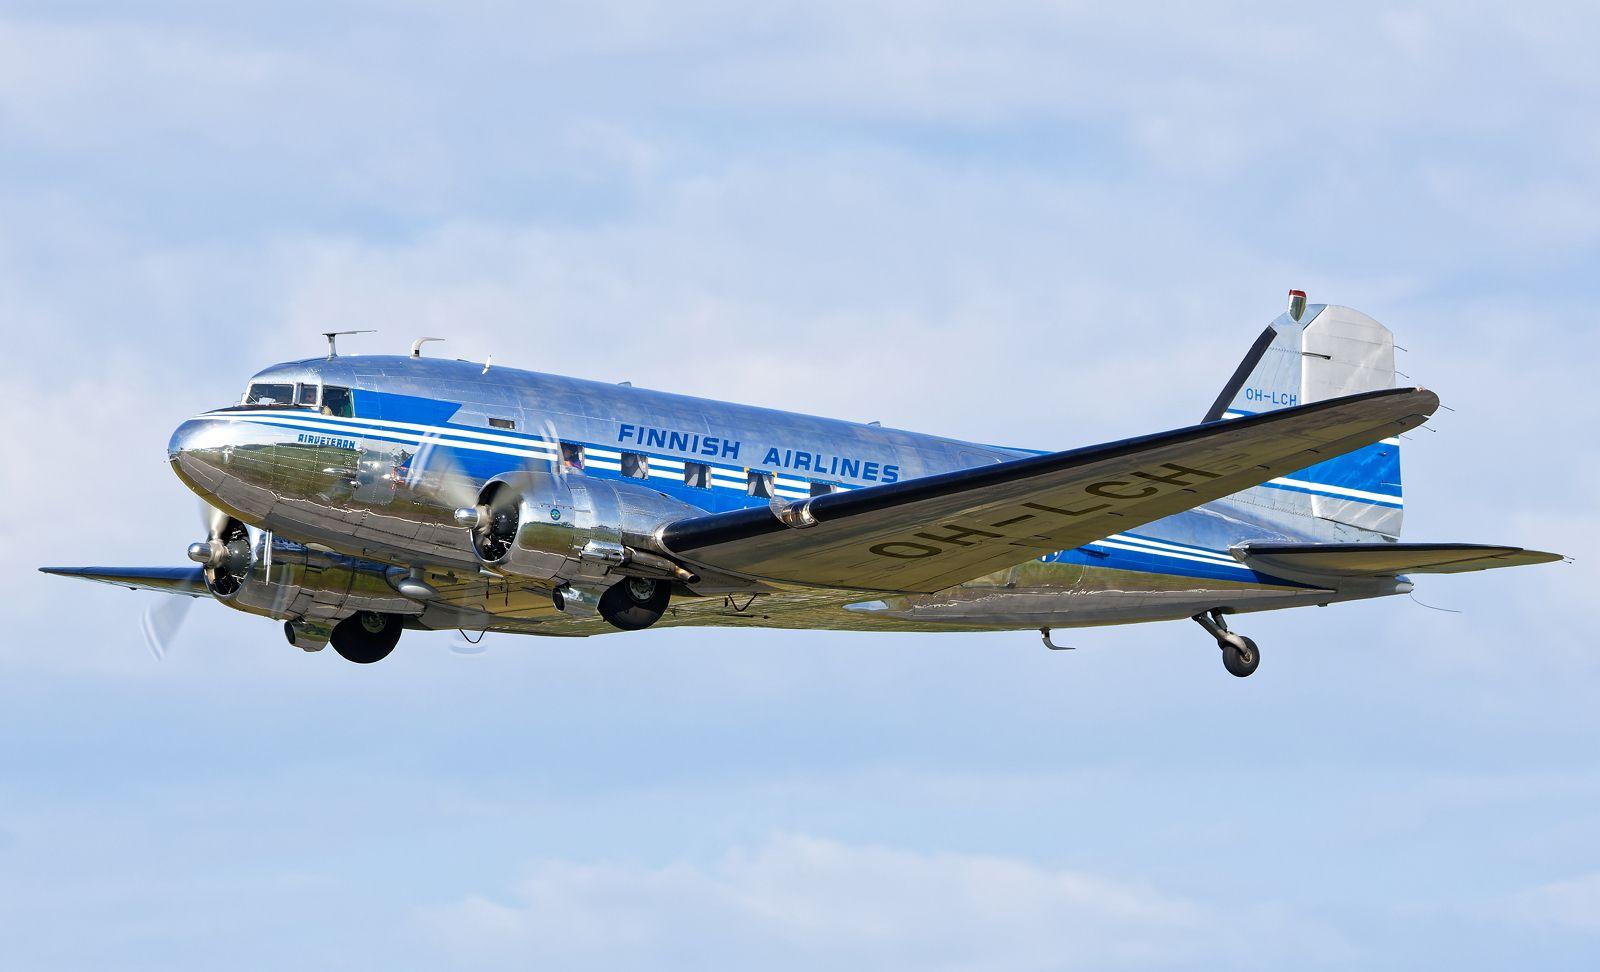 OH-LCH - Douglas DC-3 (C-53C Skytrooper) - Airveteran - 17.7.2021